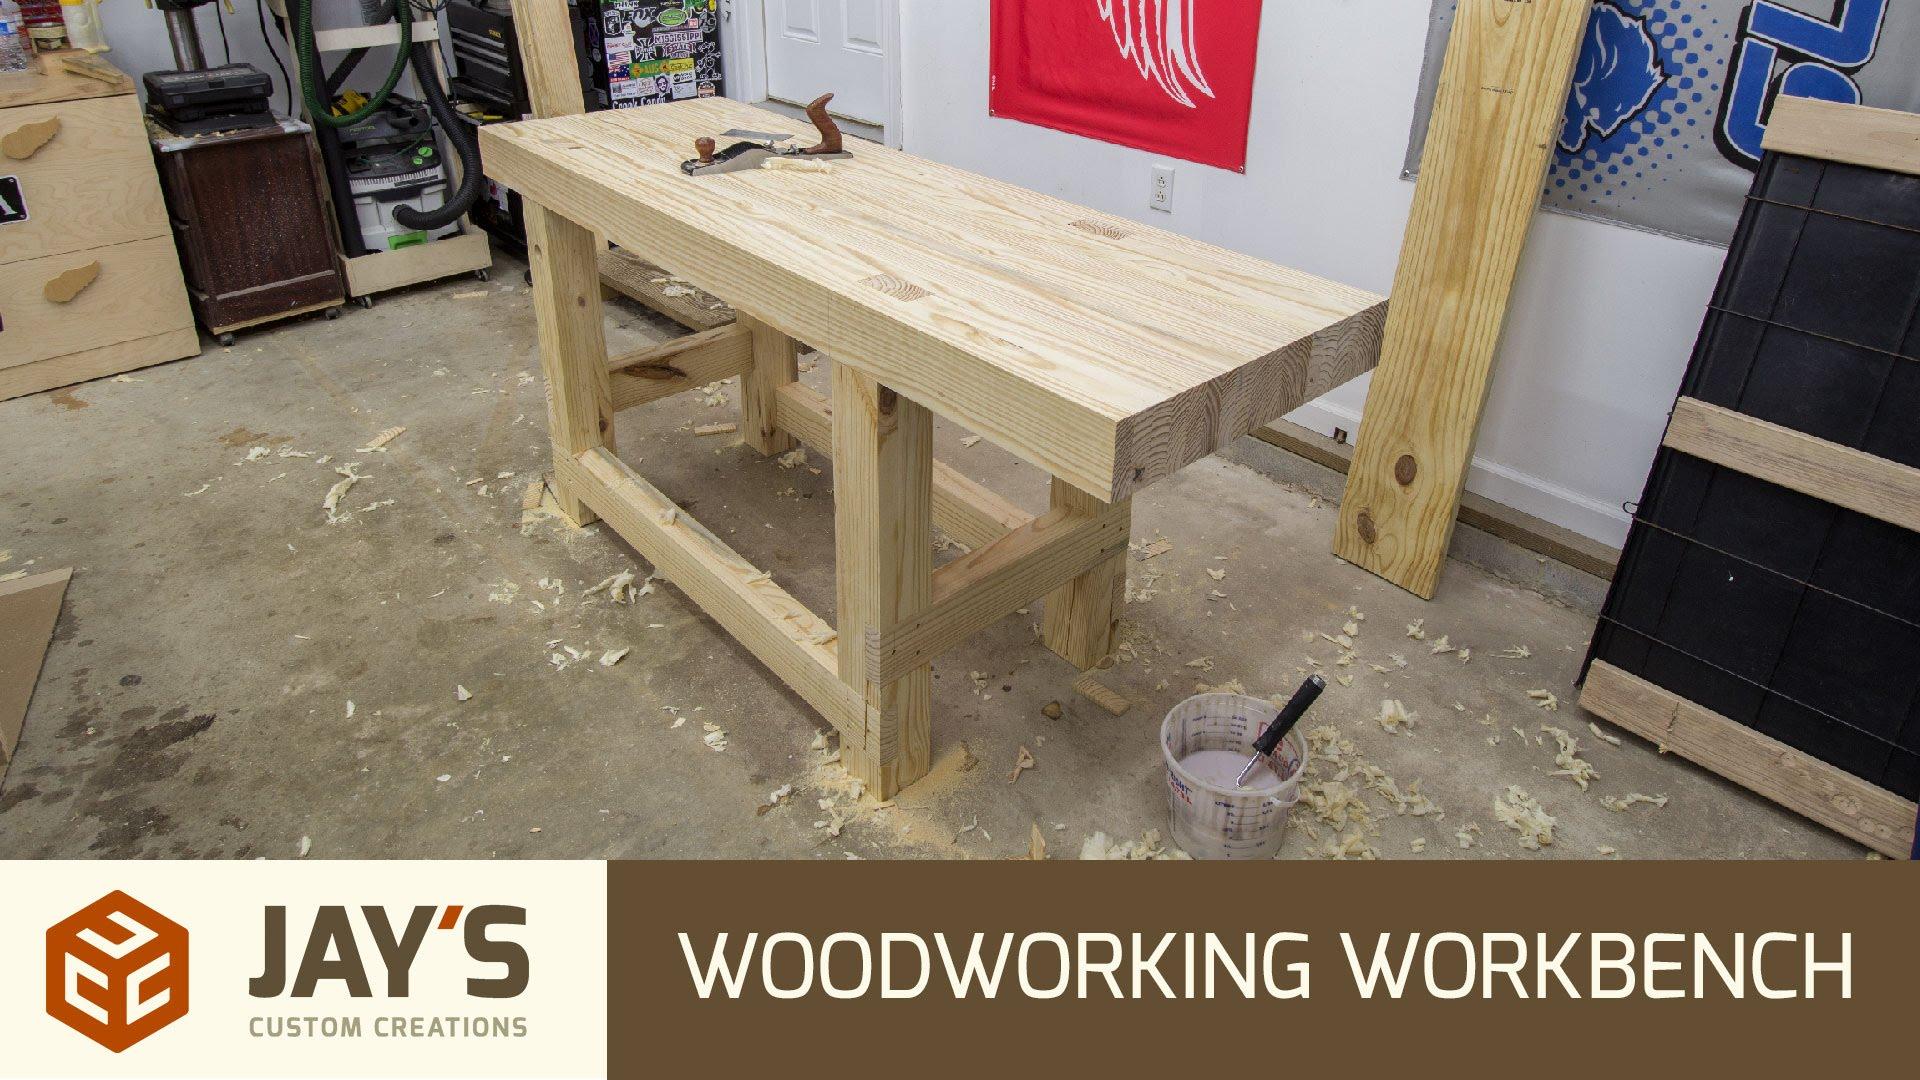 Build A Woodworking Workbench Jays Custom Creations